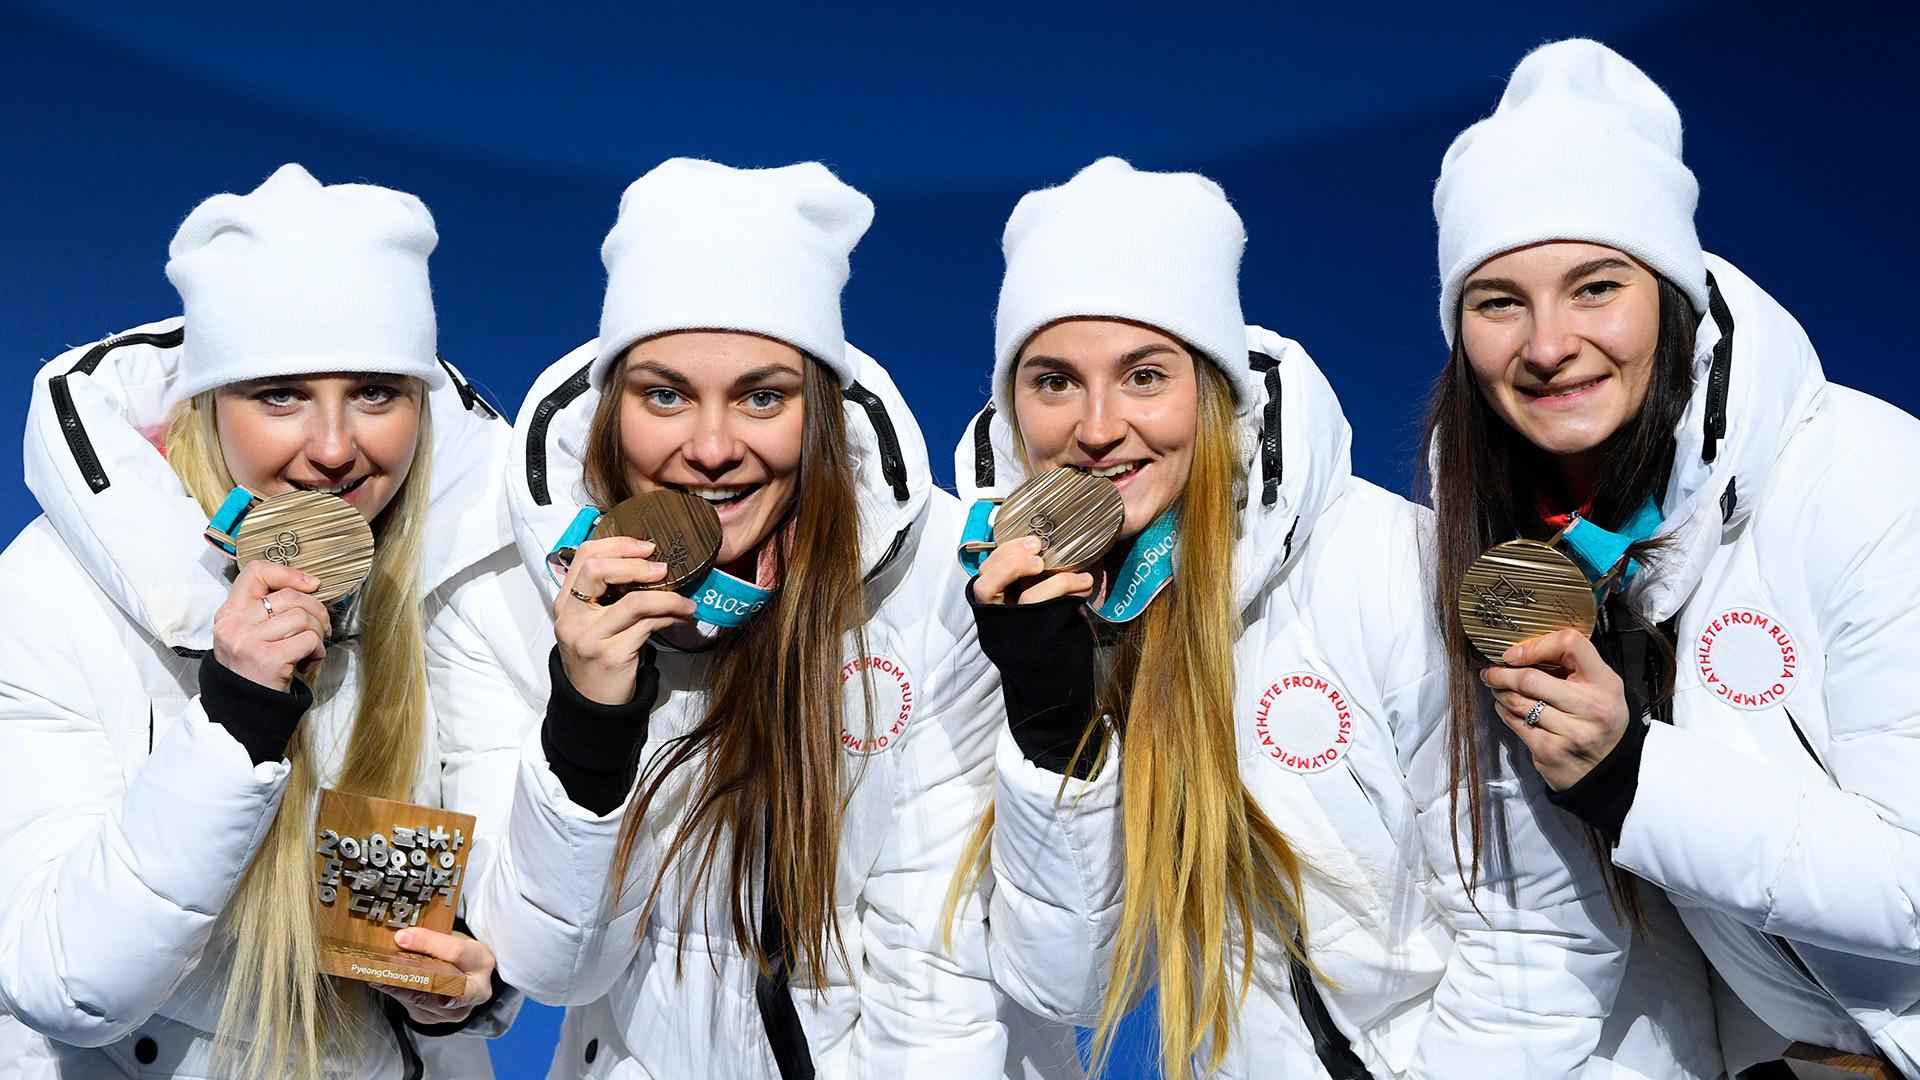 Natalia Nepryaeva, Yulia Belorukova, Anastasia Sedova et Anna Nechaevskaya